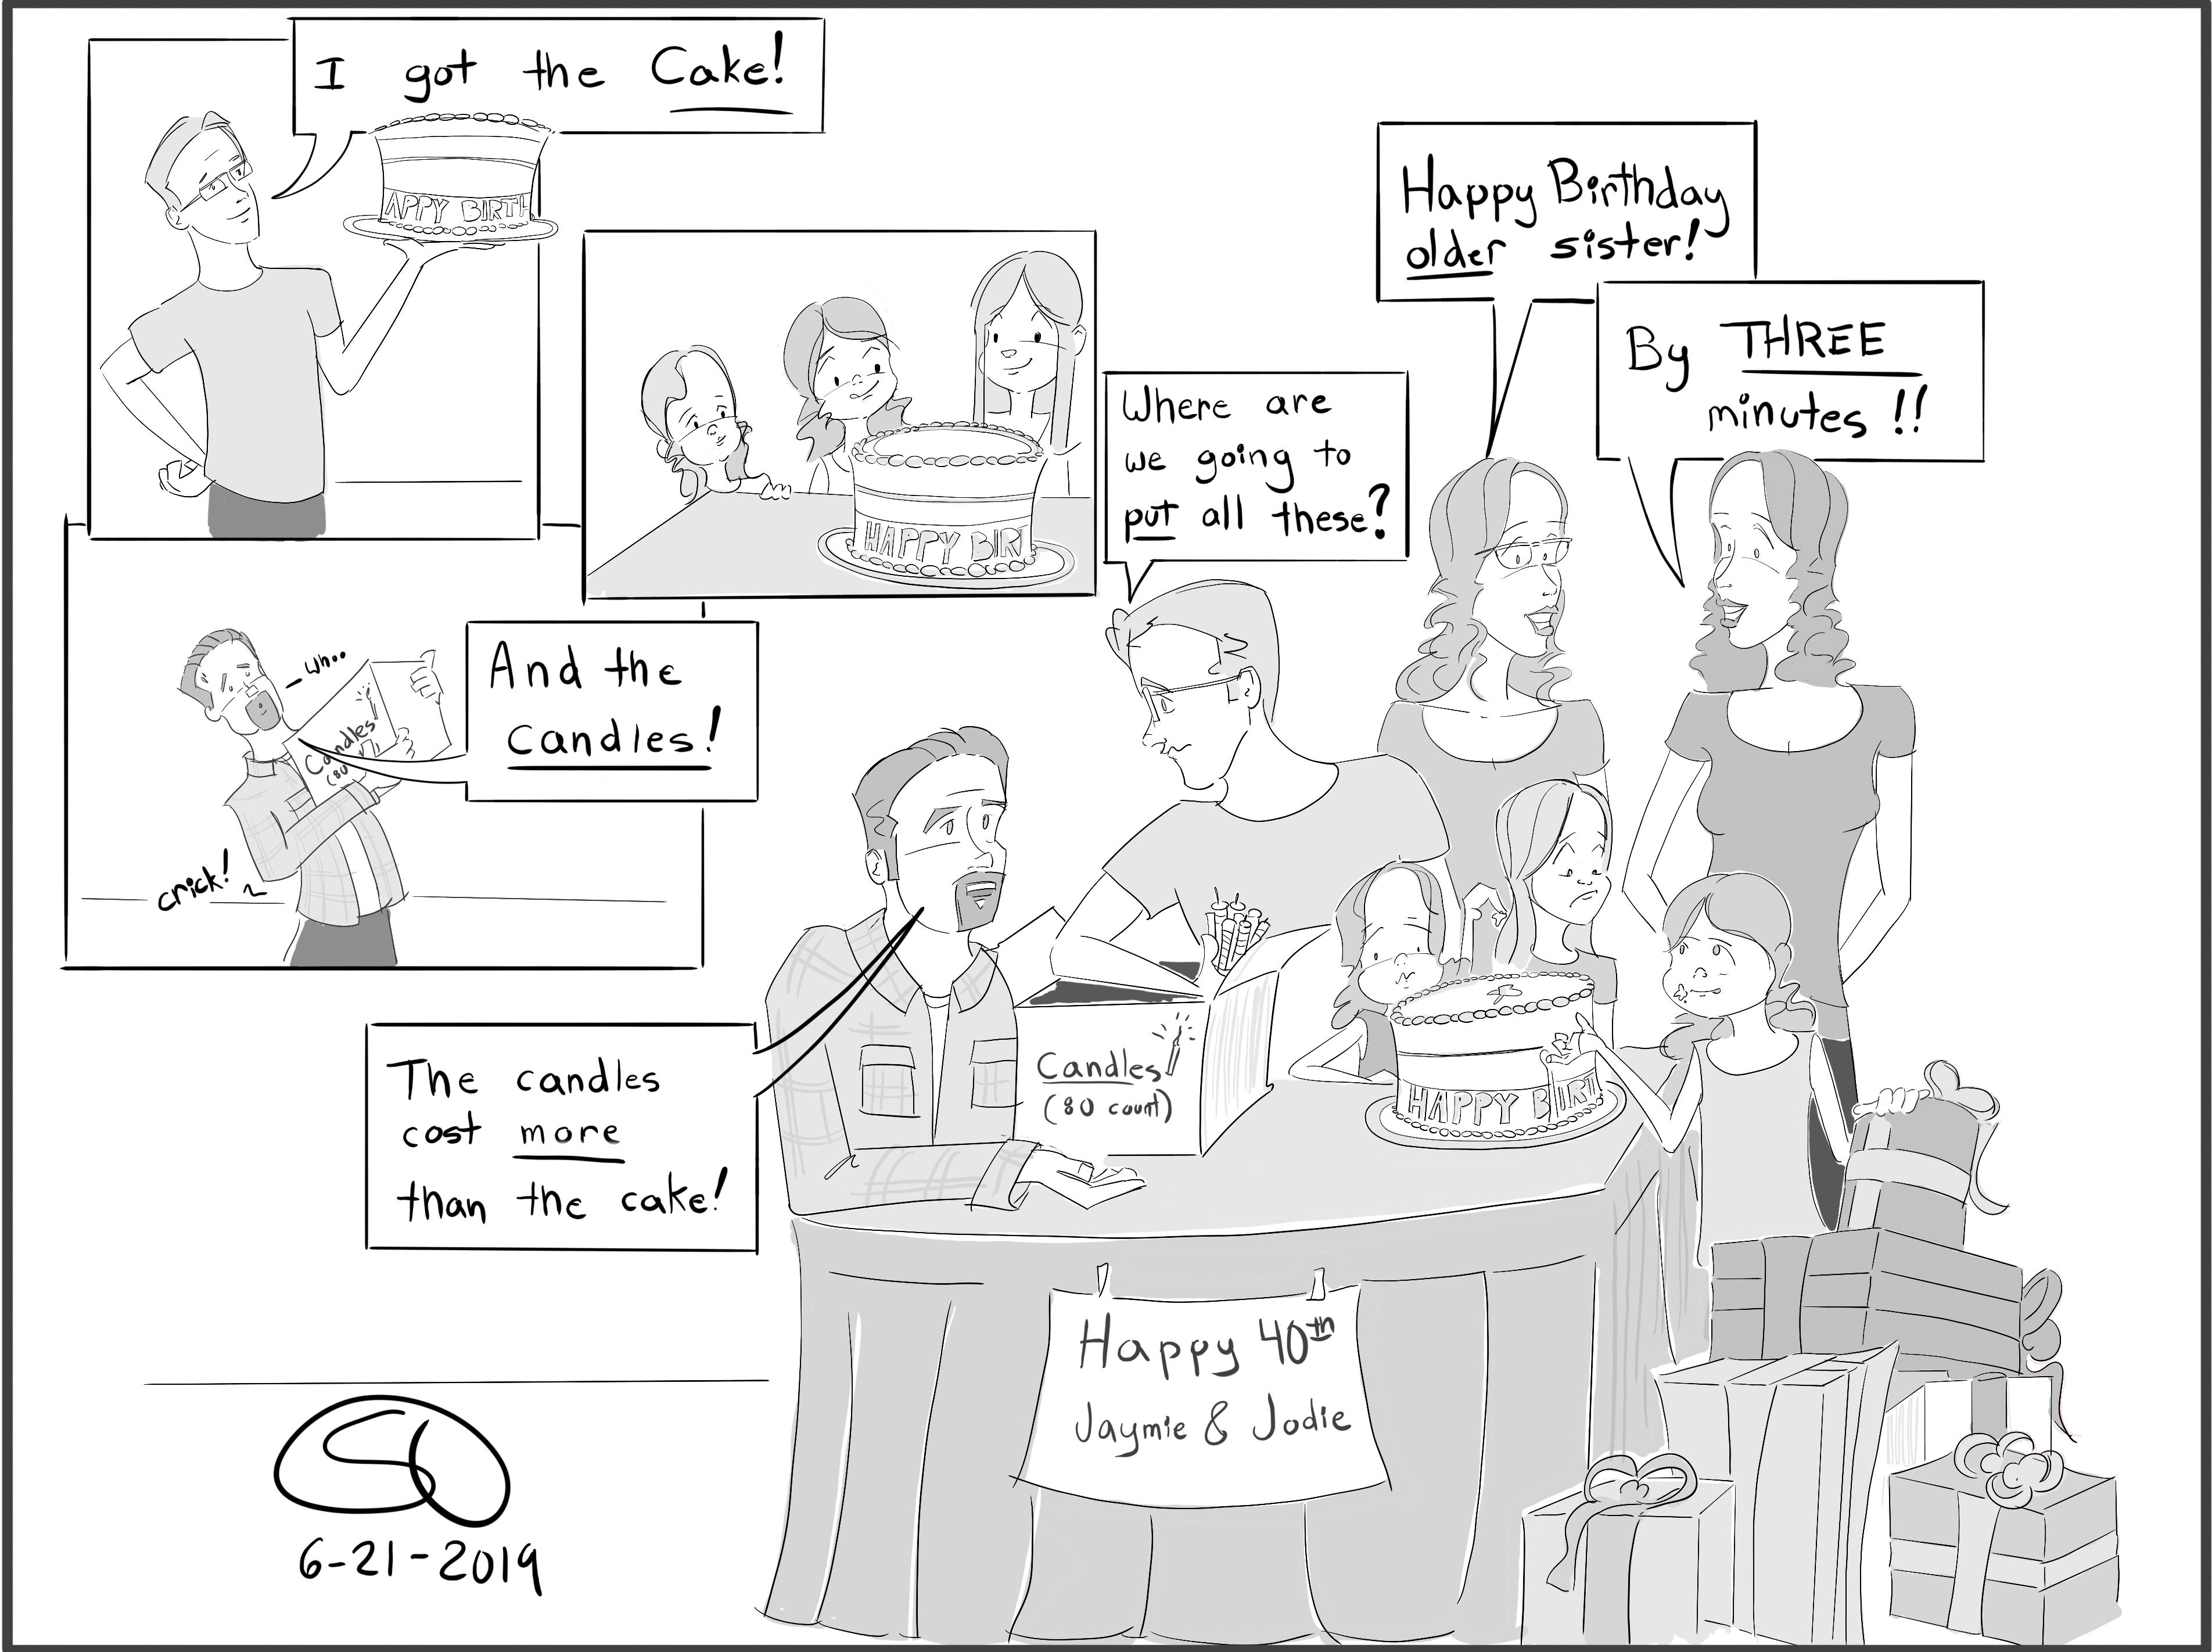 birthday 40th twins candles cake celebrate twins birthday comic